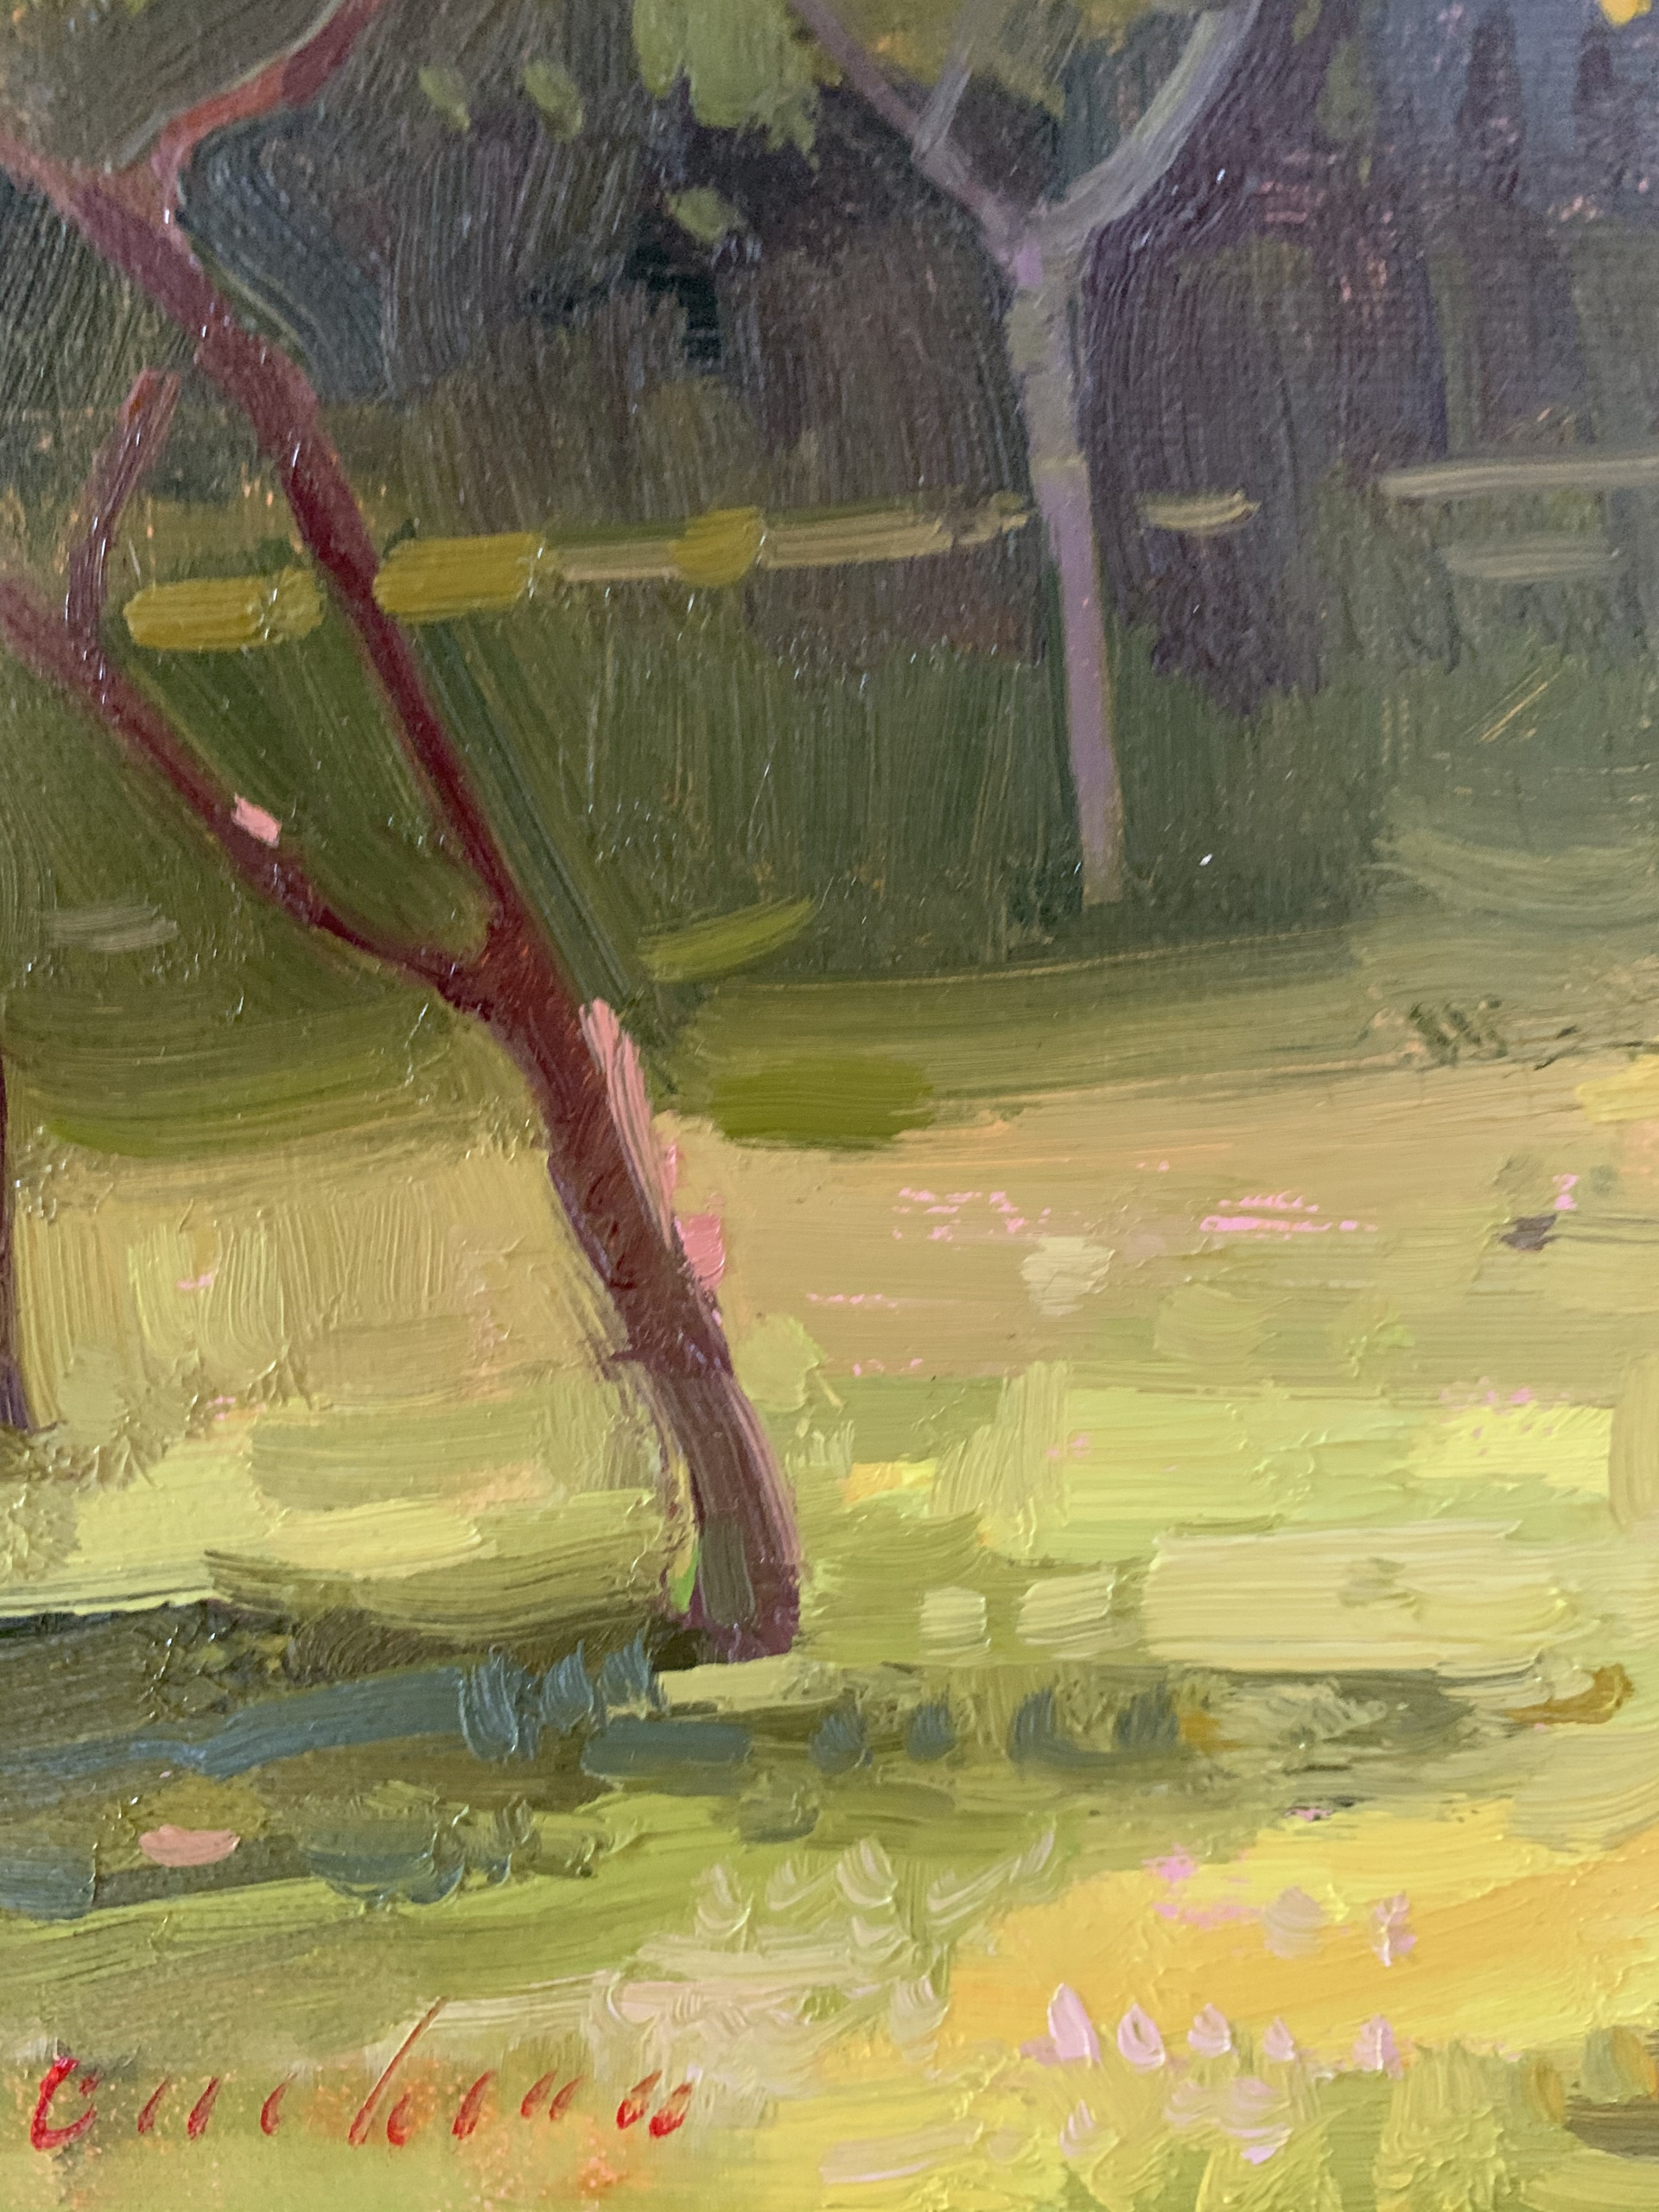 Many Shades of Green by Aimee Erickson